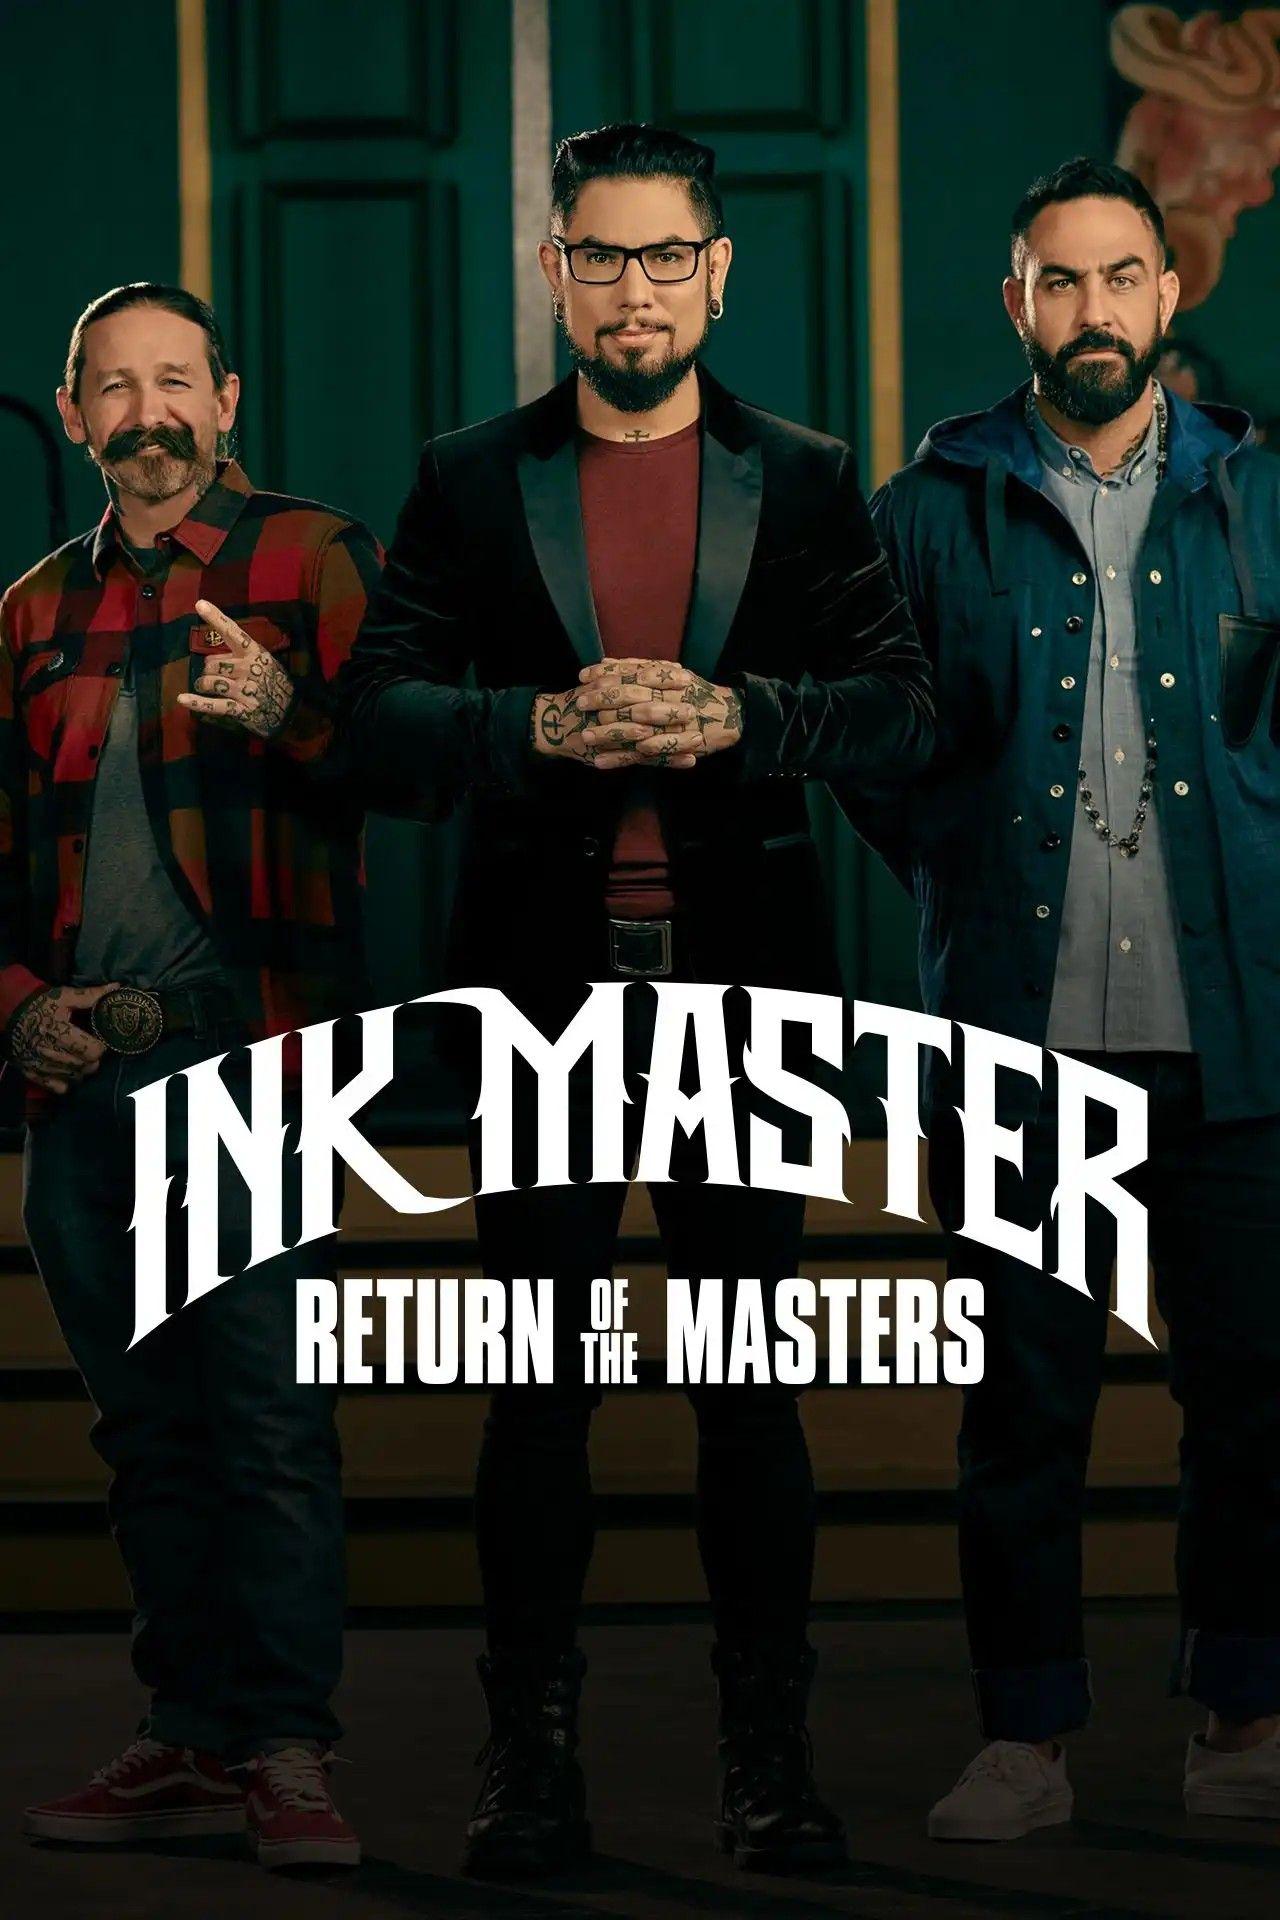 Ink Master Ink master, Ink master winners, Ink